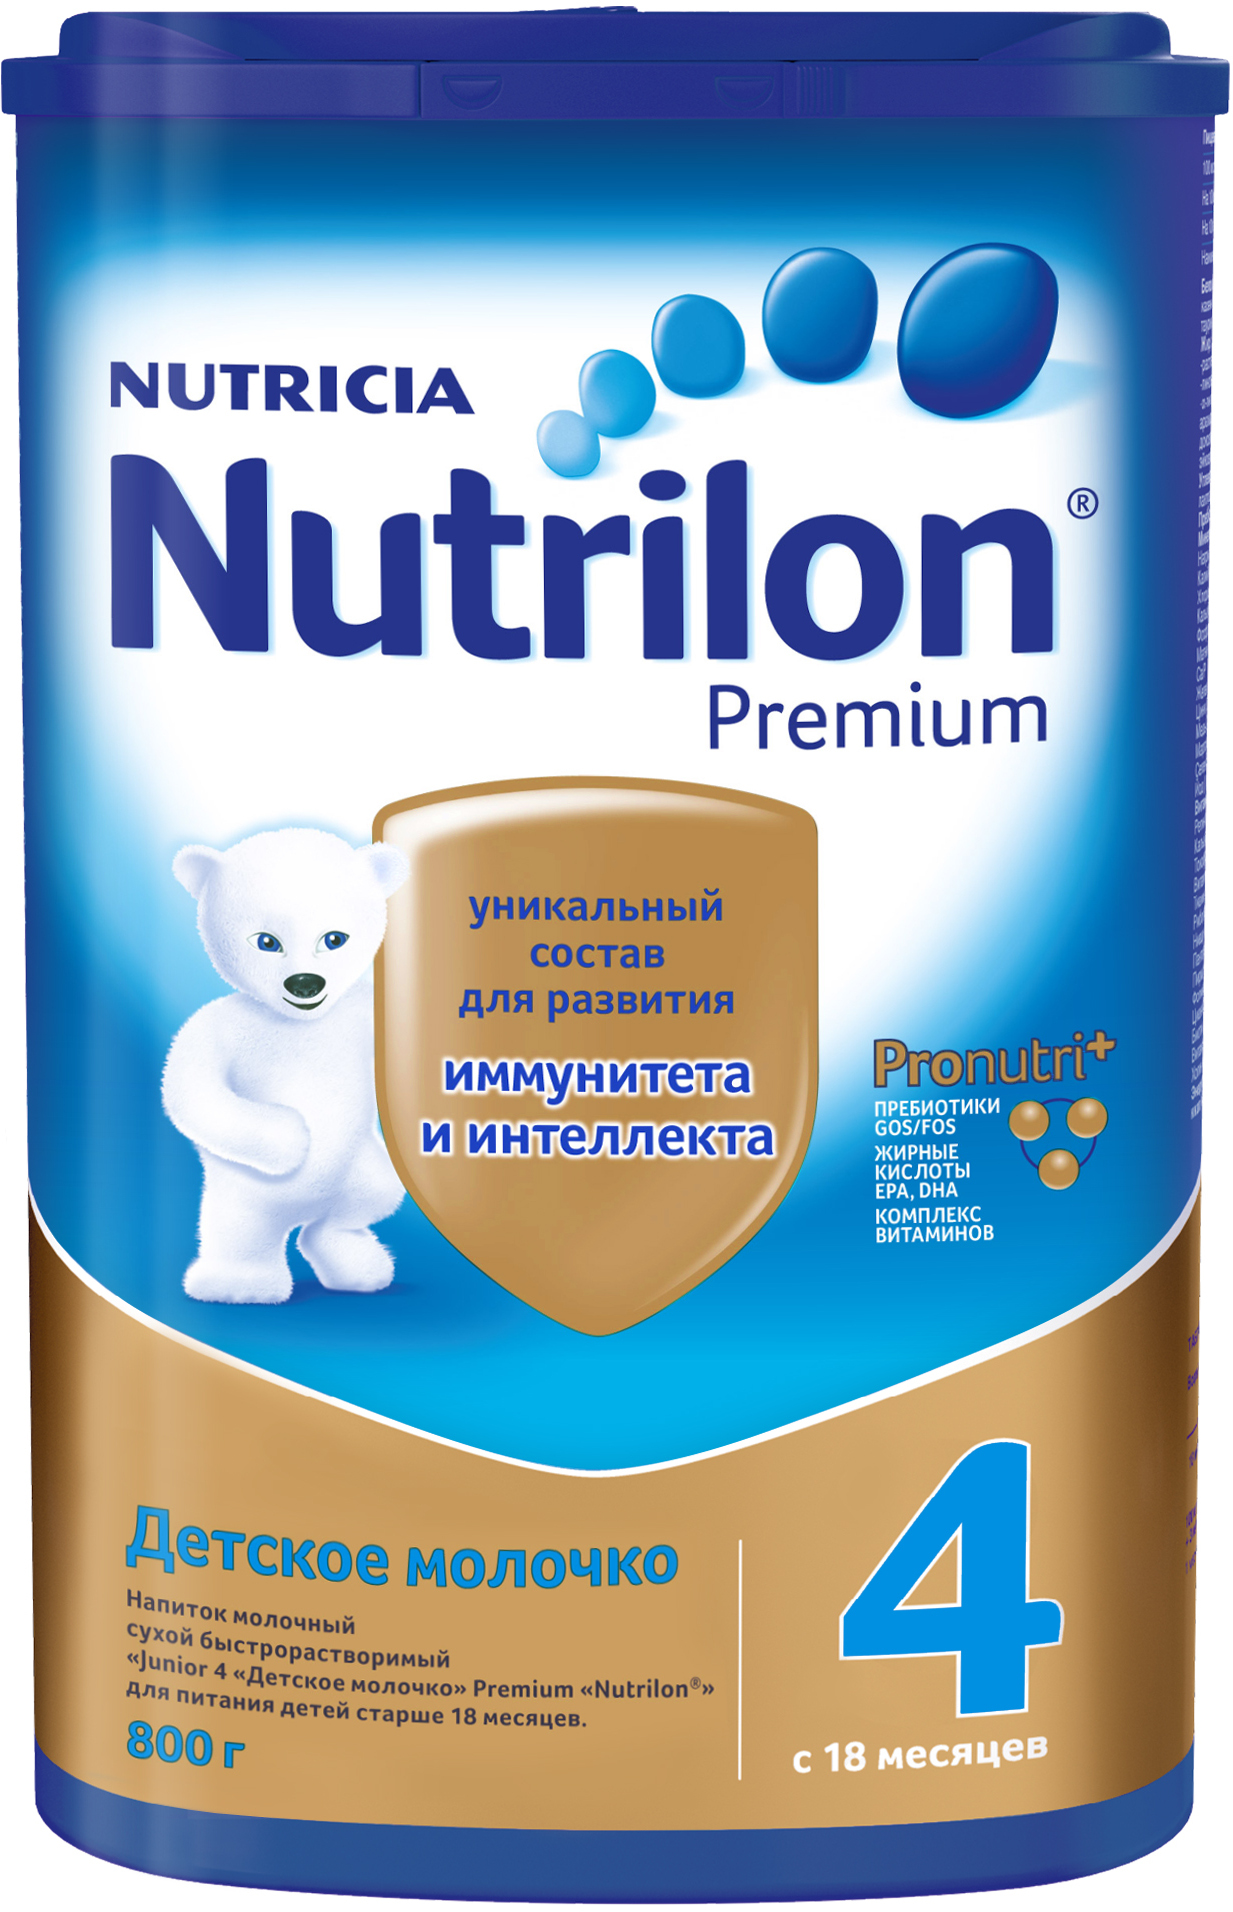 Молочная смесь Nutricia Nutrilon (Nutricia) 4 Premium (c 18 месяцев) 800 г цены онлайн